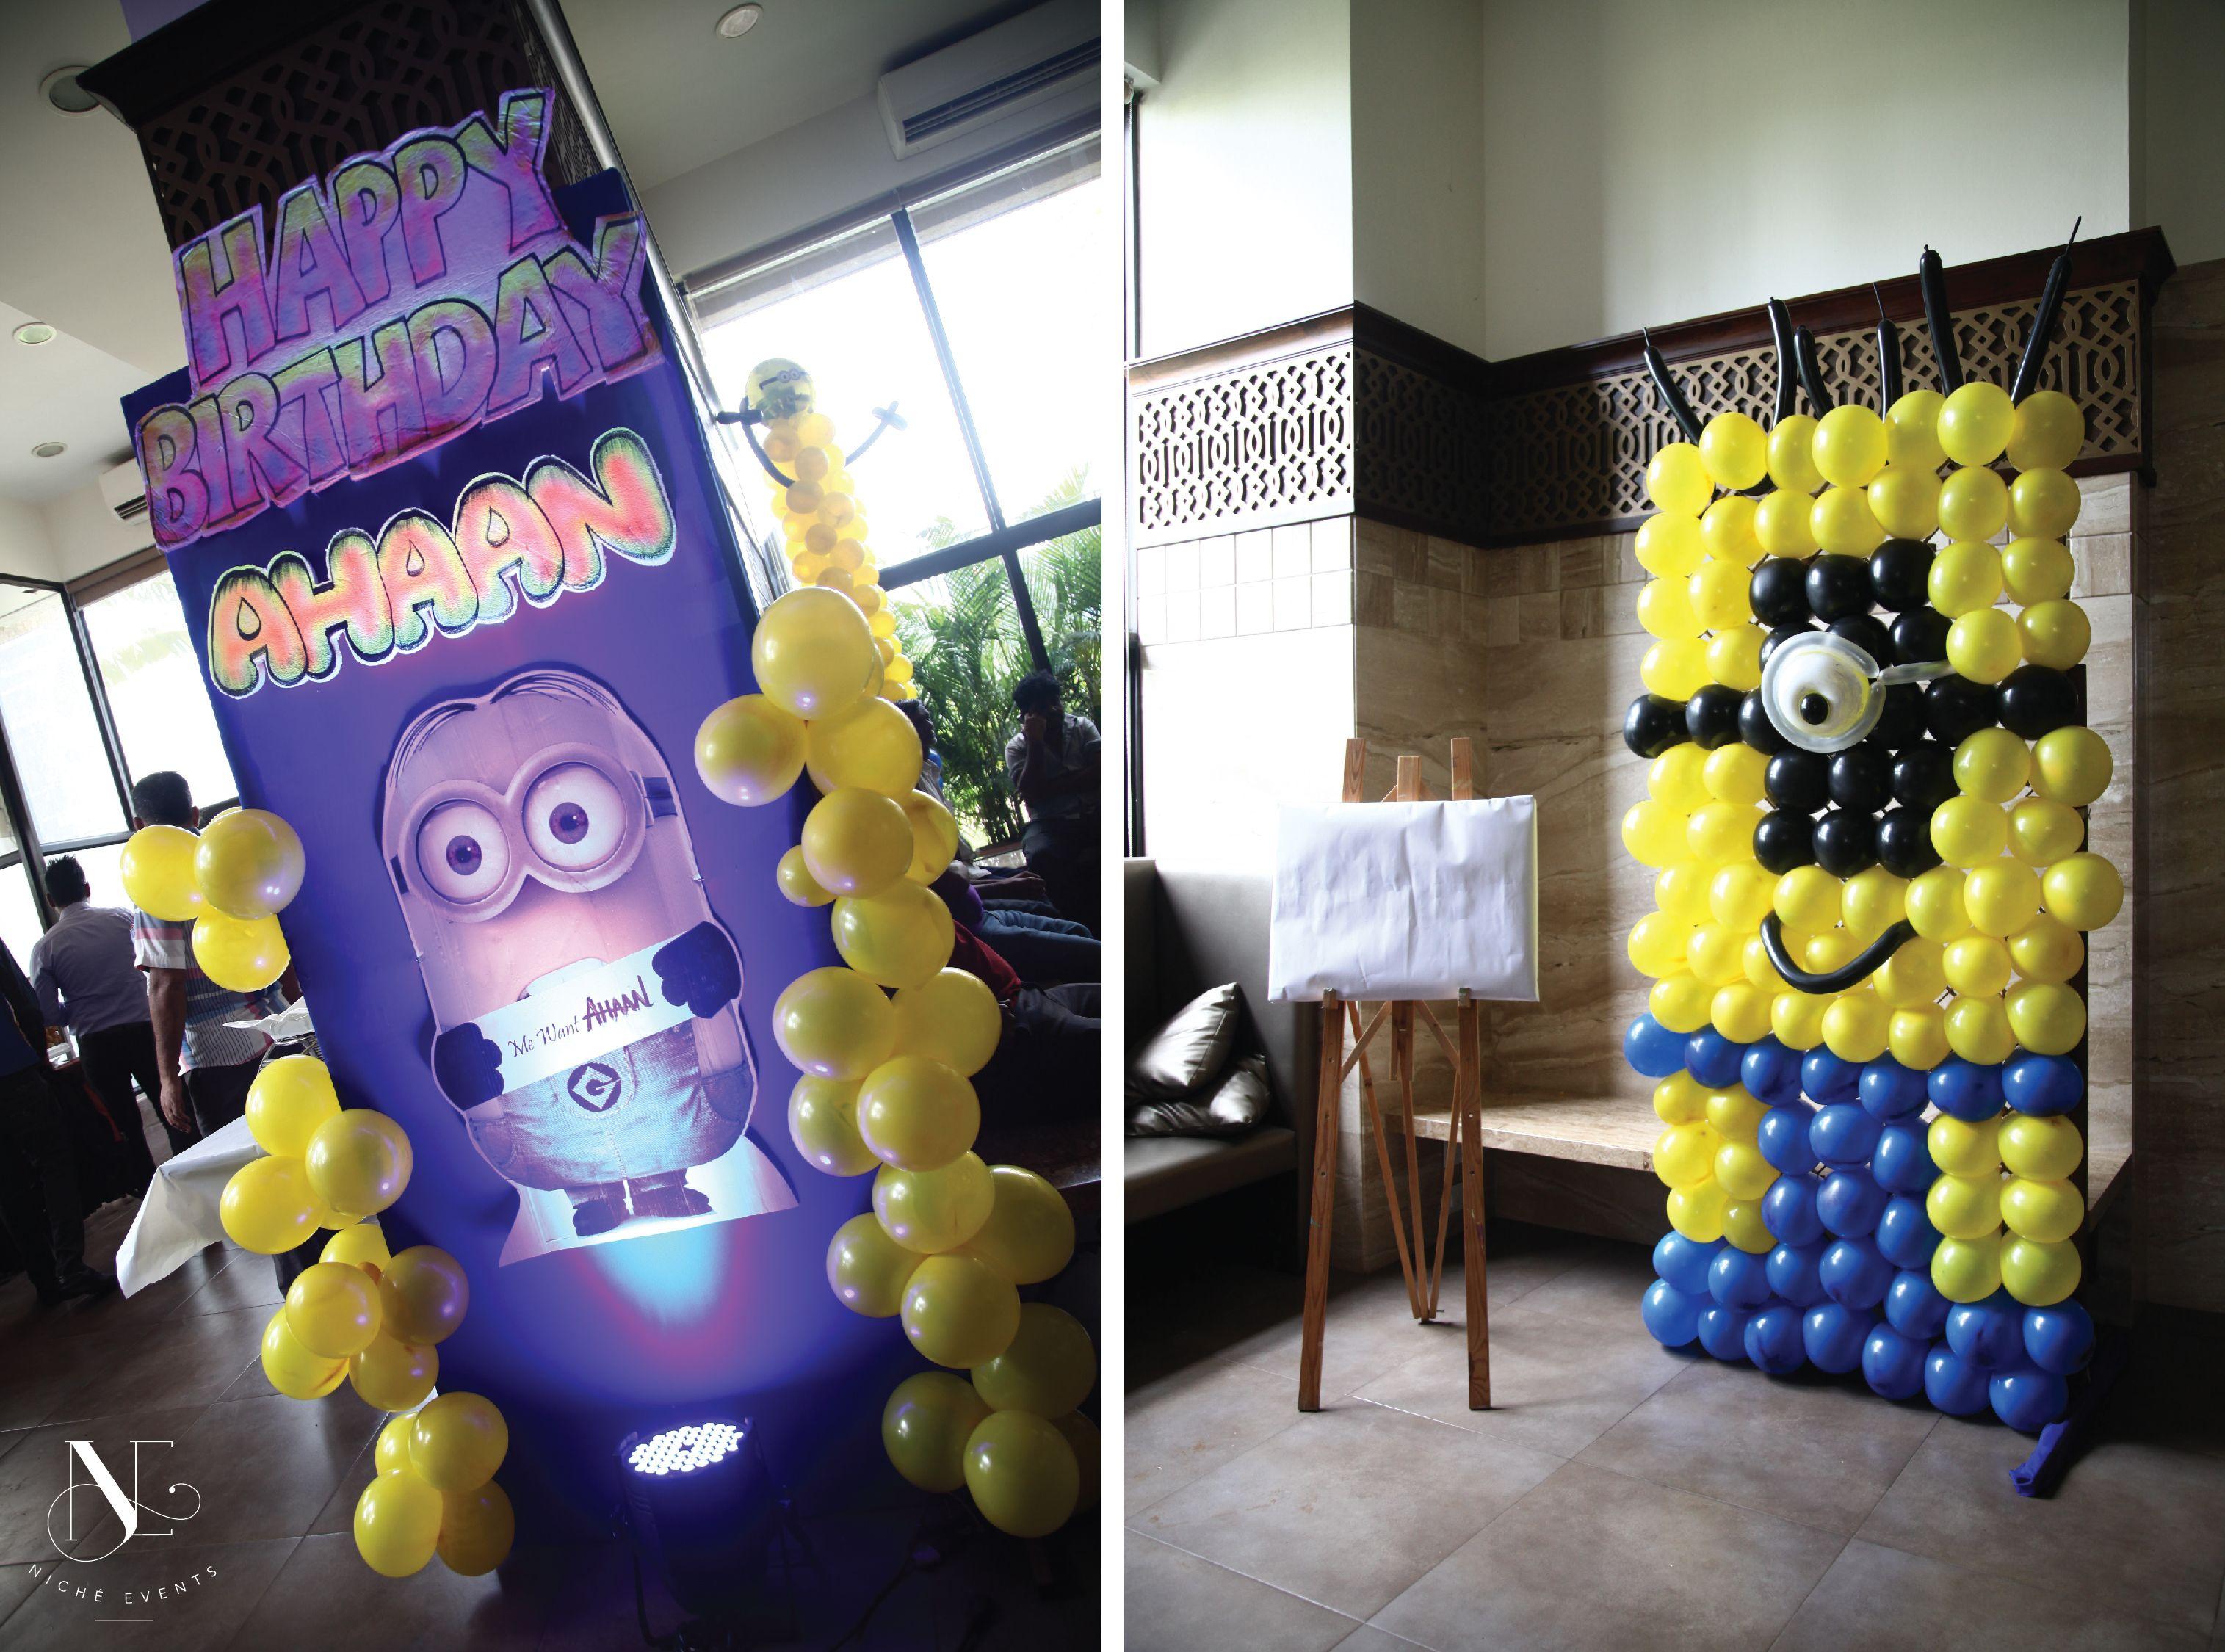 Minion Themed Balloon Decor by Niche Events